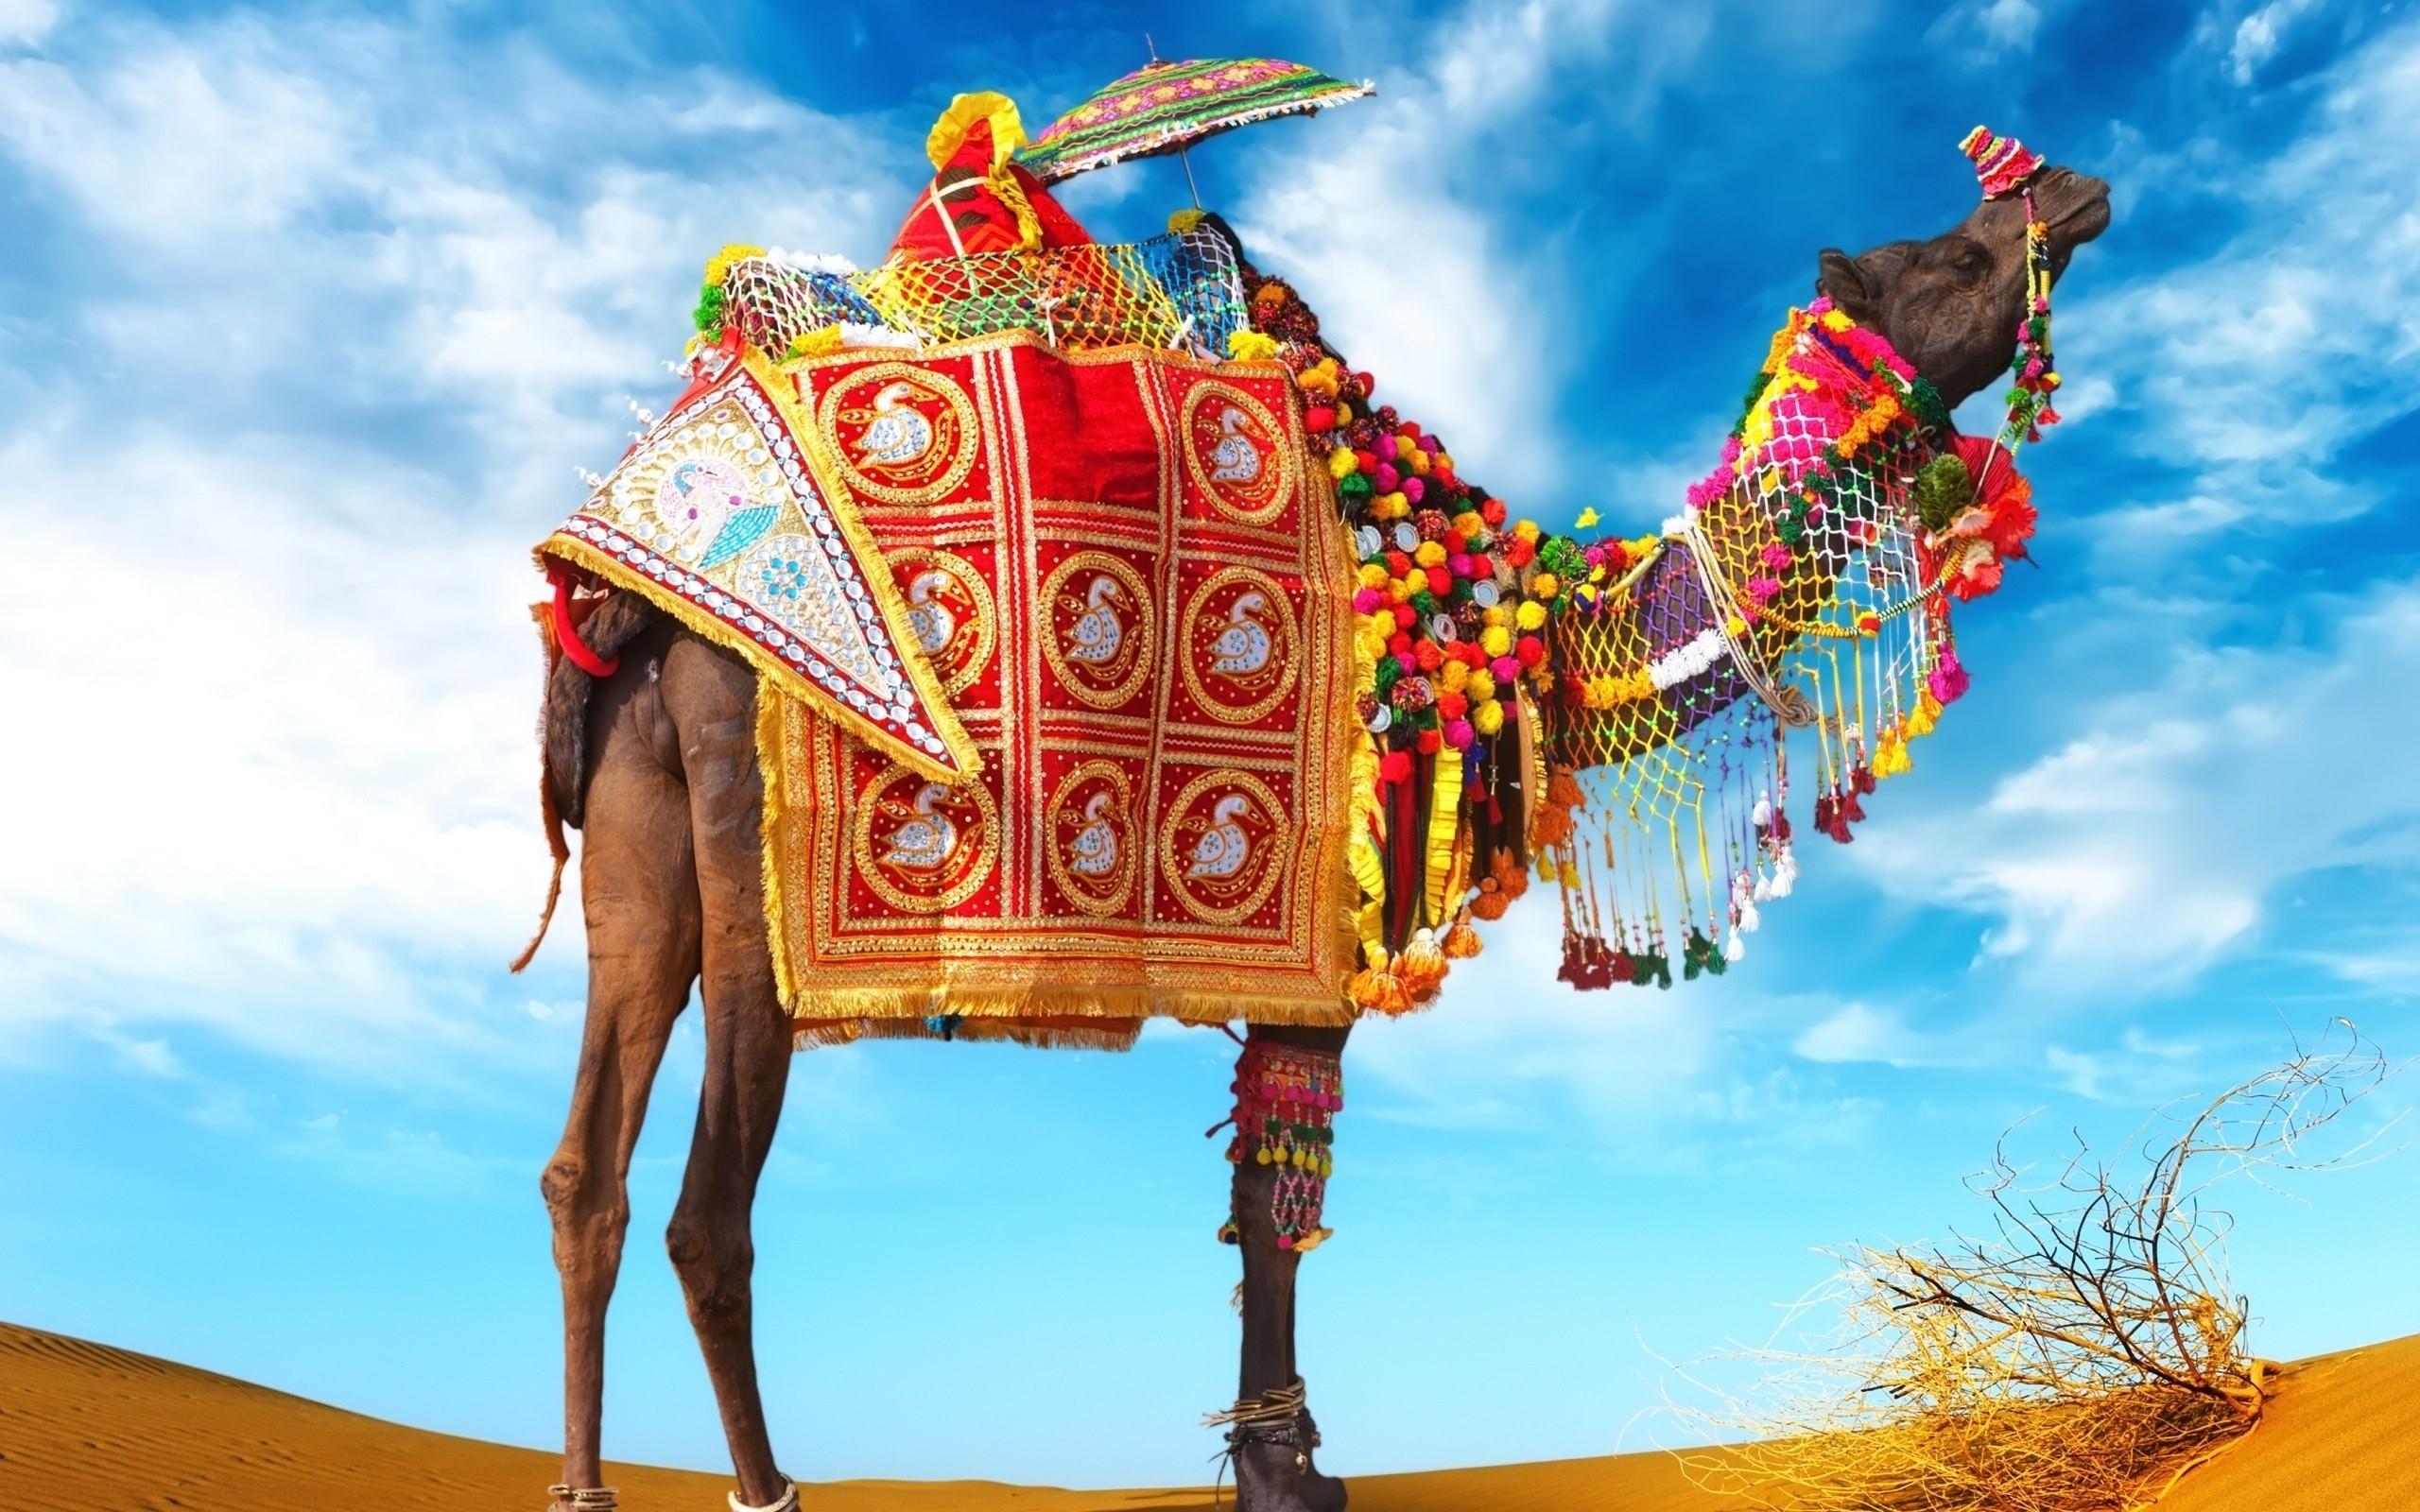 Decorative_Camel_in_Desert_HD_Photo thar d